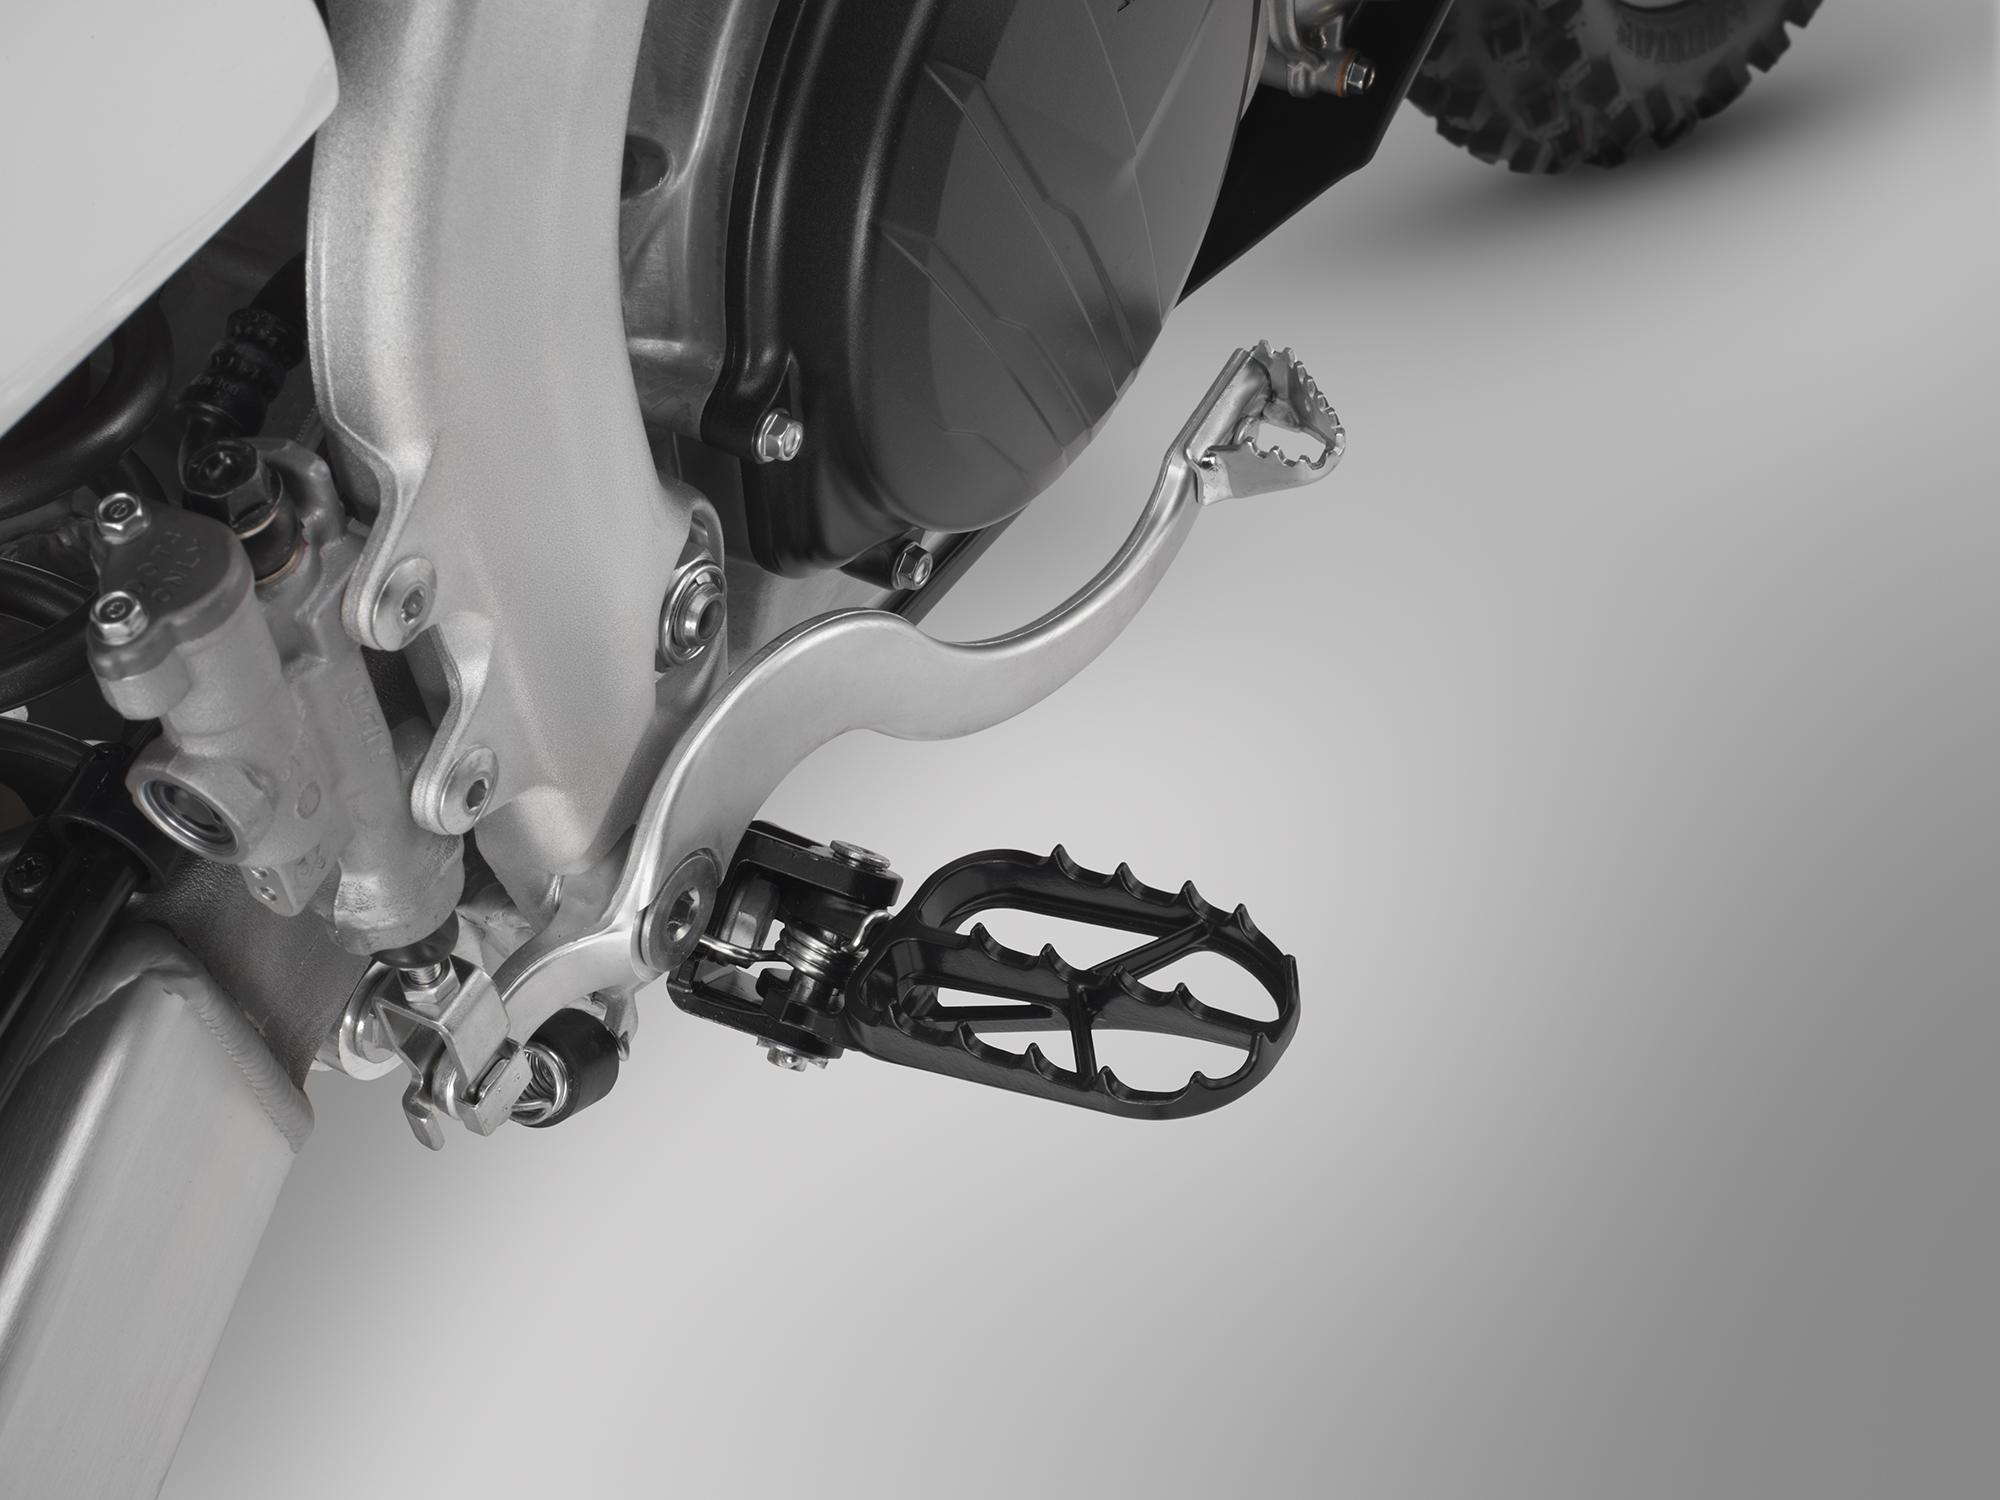 19 Honda CRF450RX_footpeg.jpg